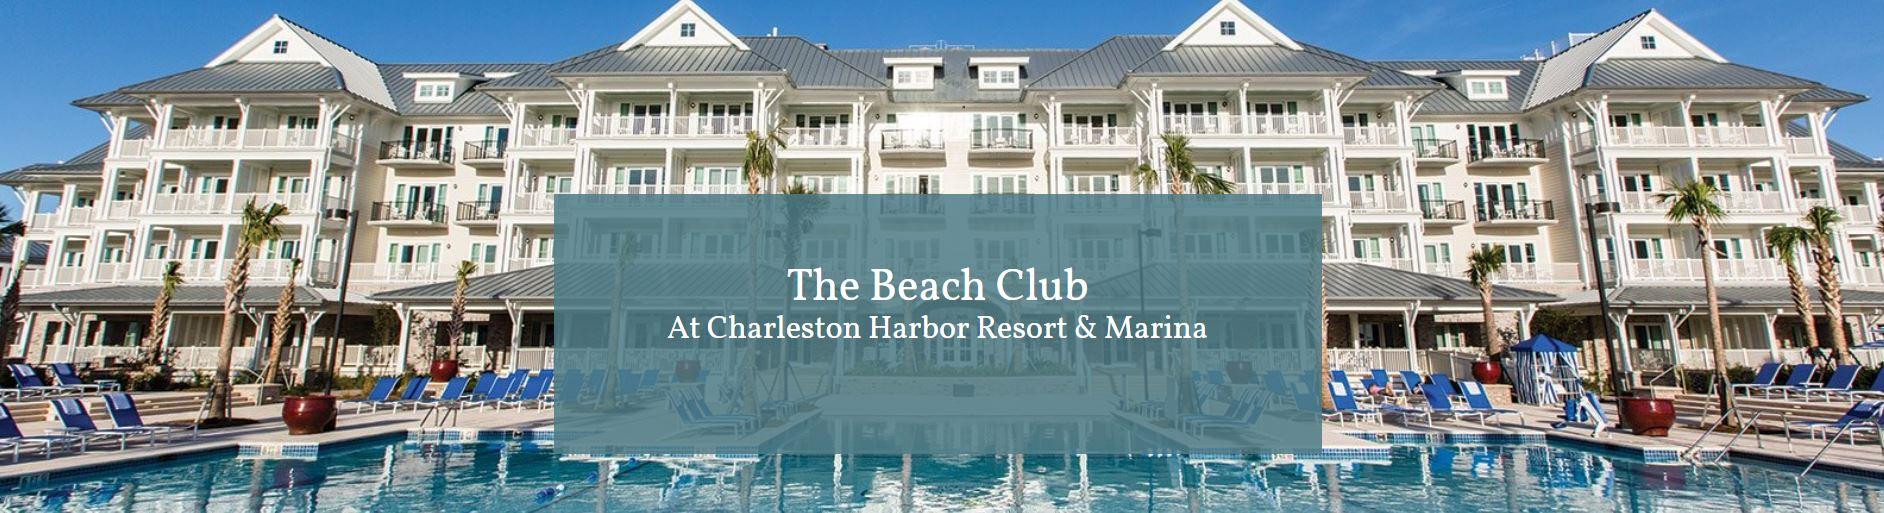 Conference/CharlestonHarborResort_image.JPG